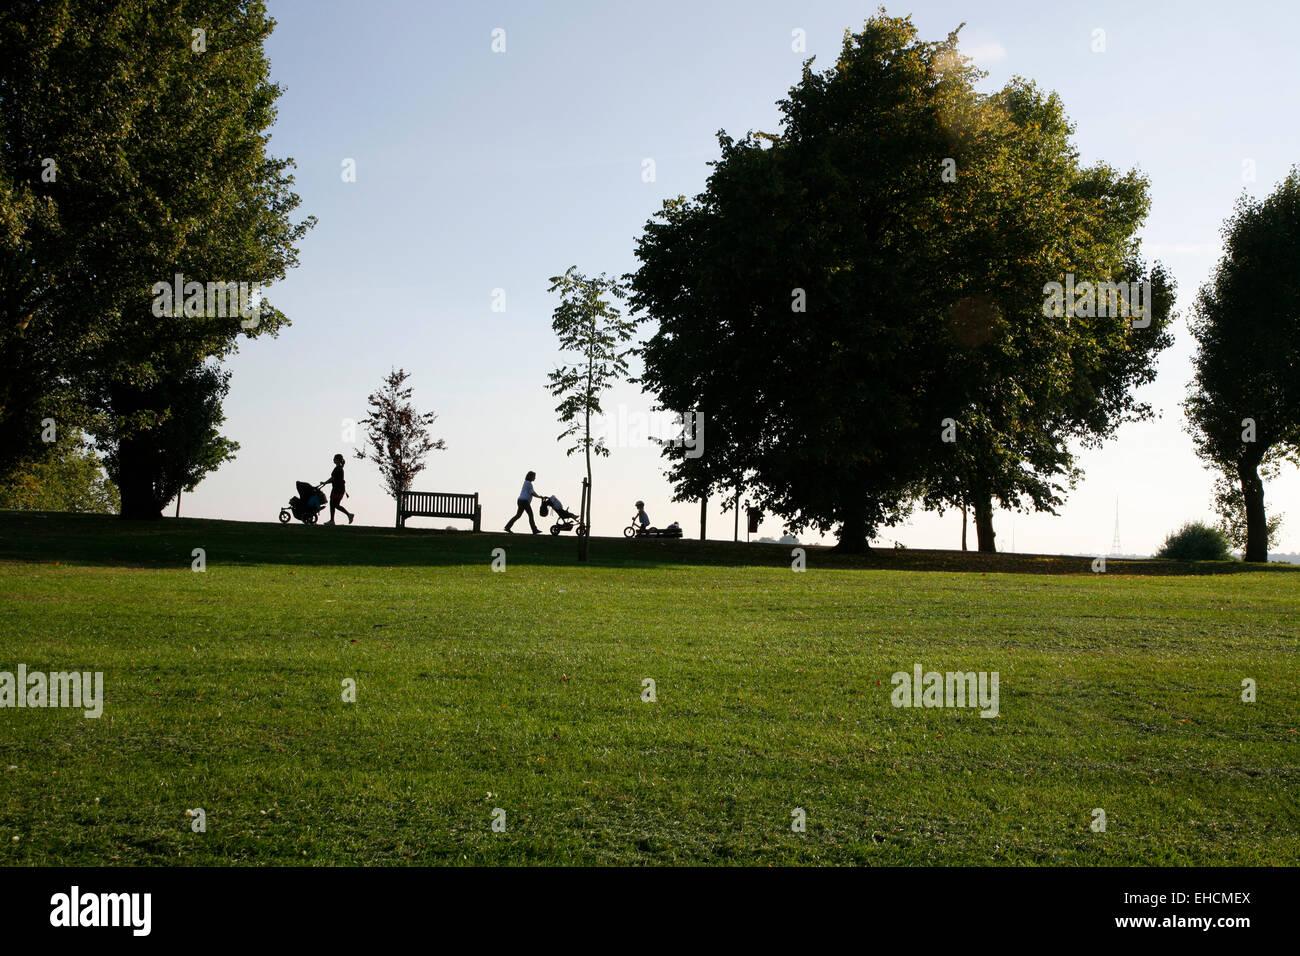 Hilly Fields, Brockley, London, UK. - Stock Image